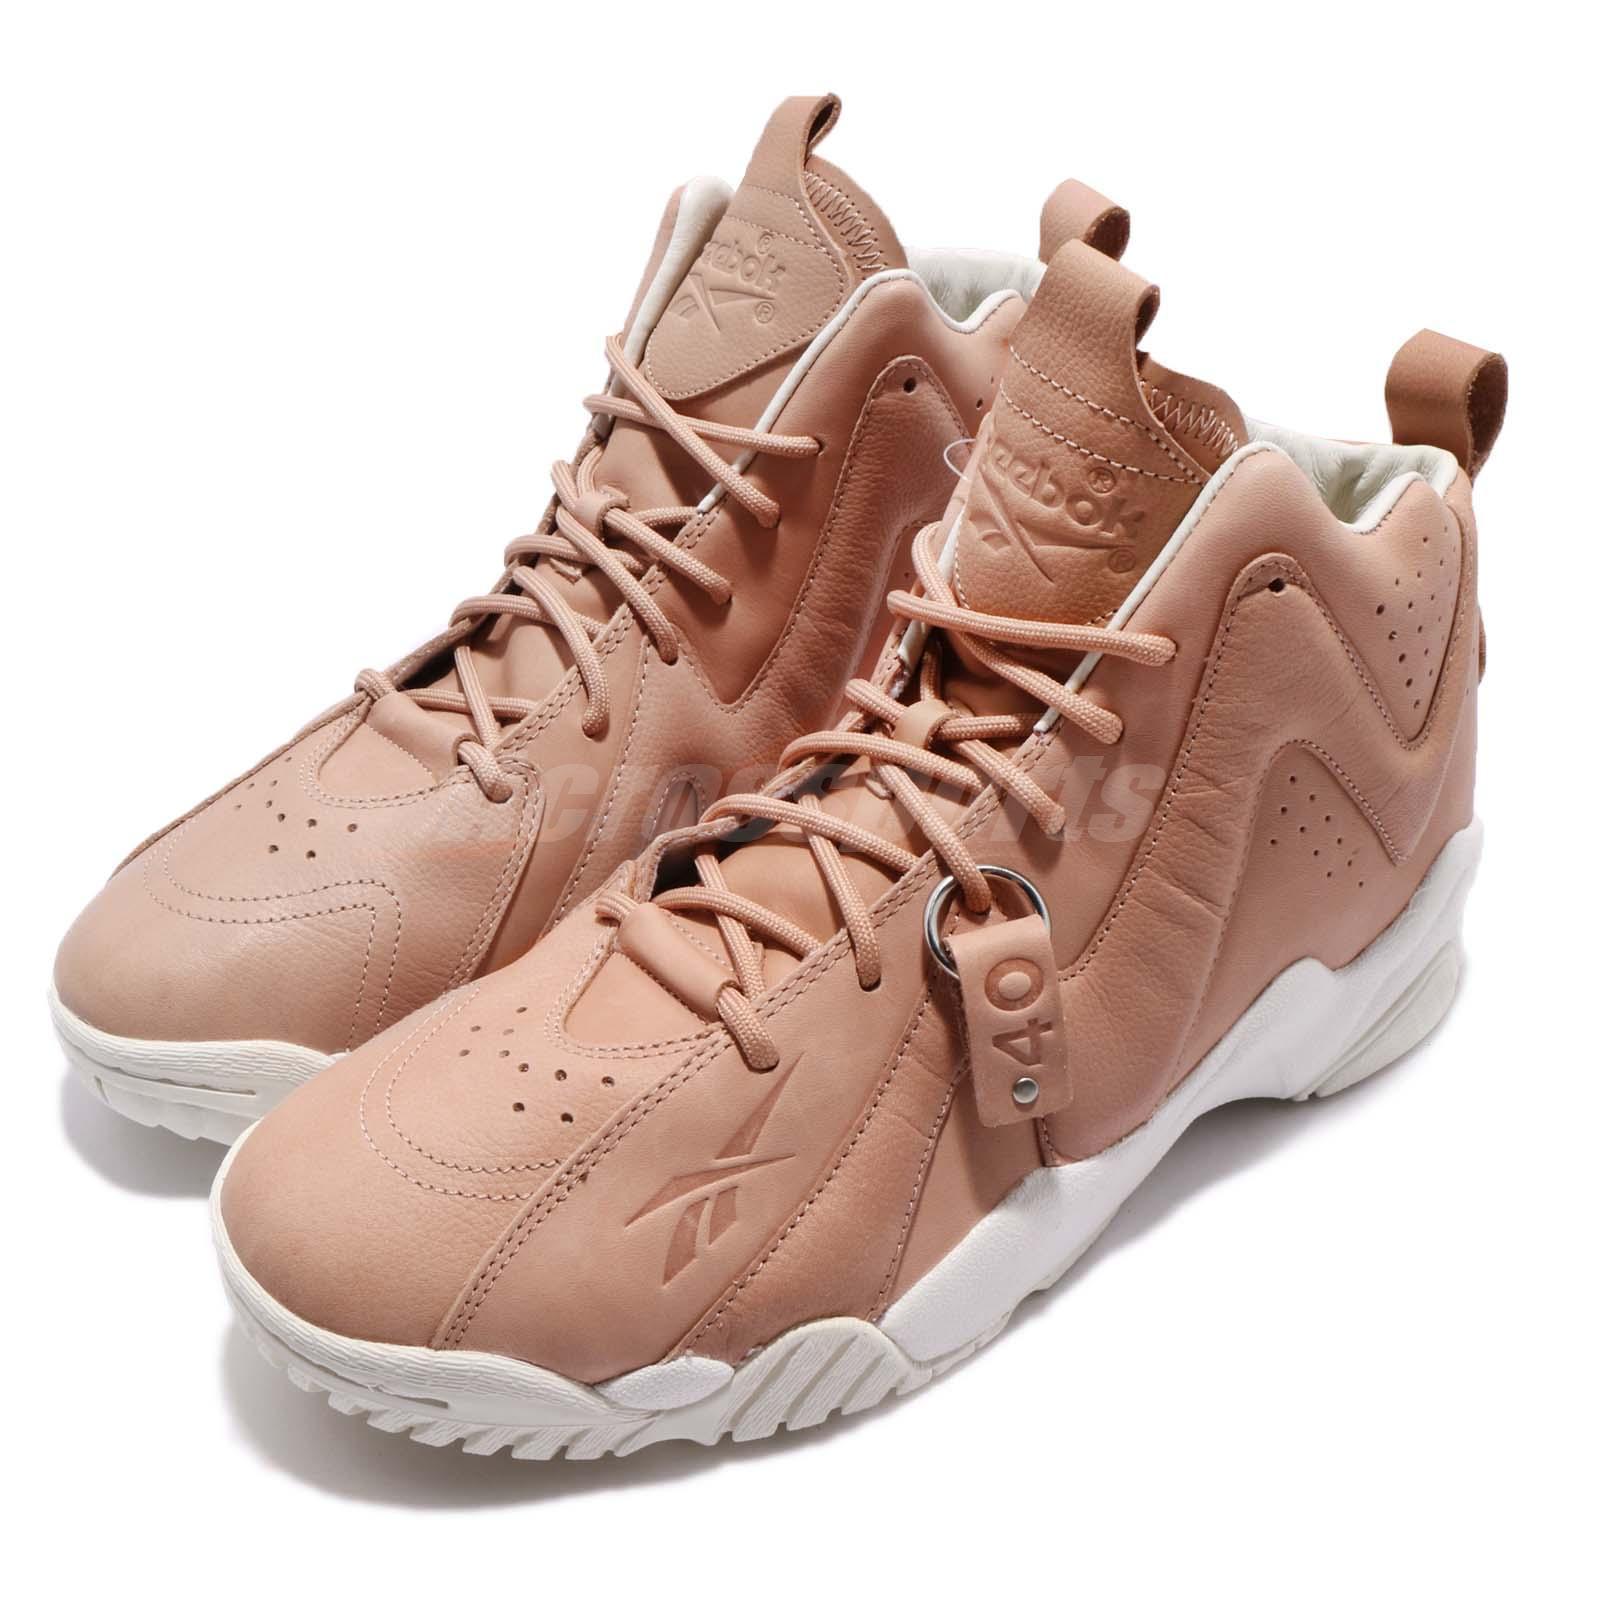 Details about Reebok Kamikaze II Vegtan Shawn Kemp 2 British Tan Men Basketball Shoes BS9669